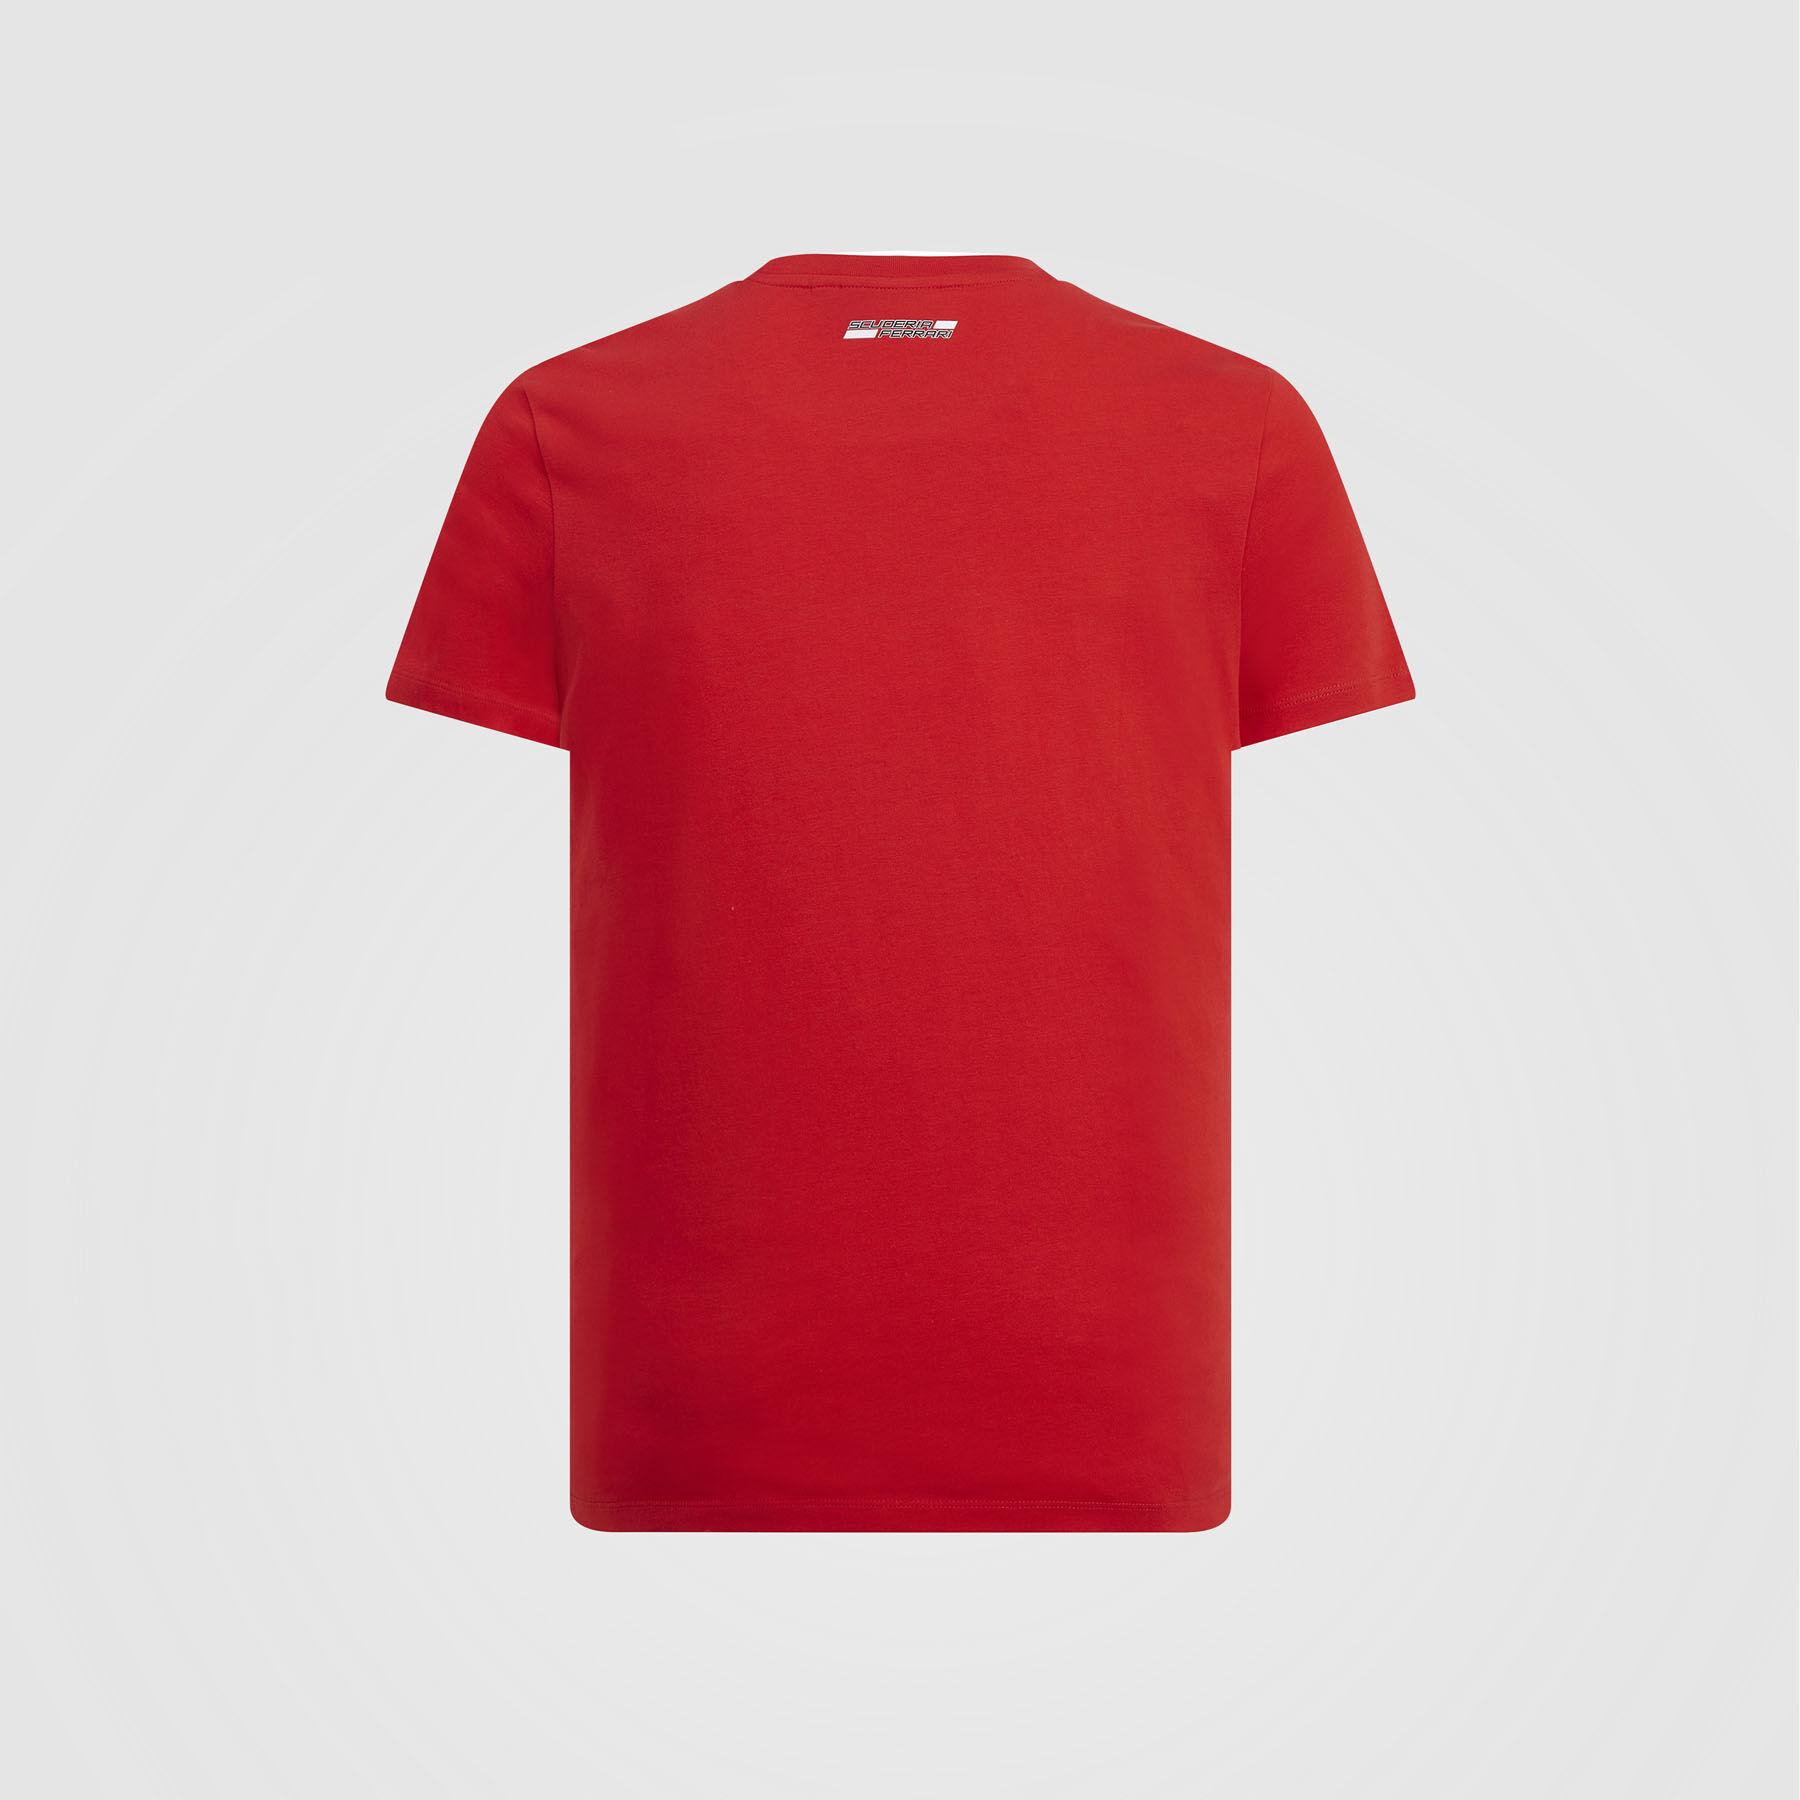 Ferrari Mens Scuderia 2019 F1/™ Sebastian Vettel Driver T-shirt